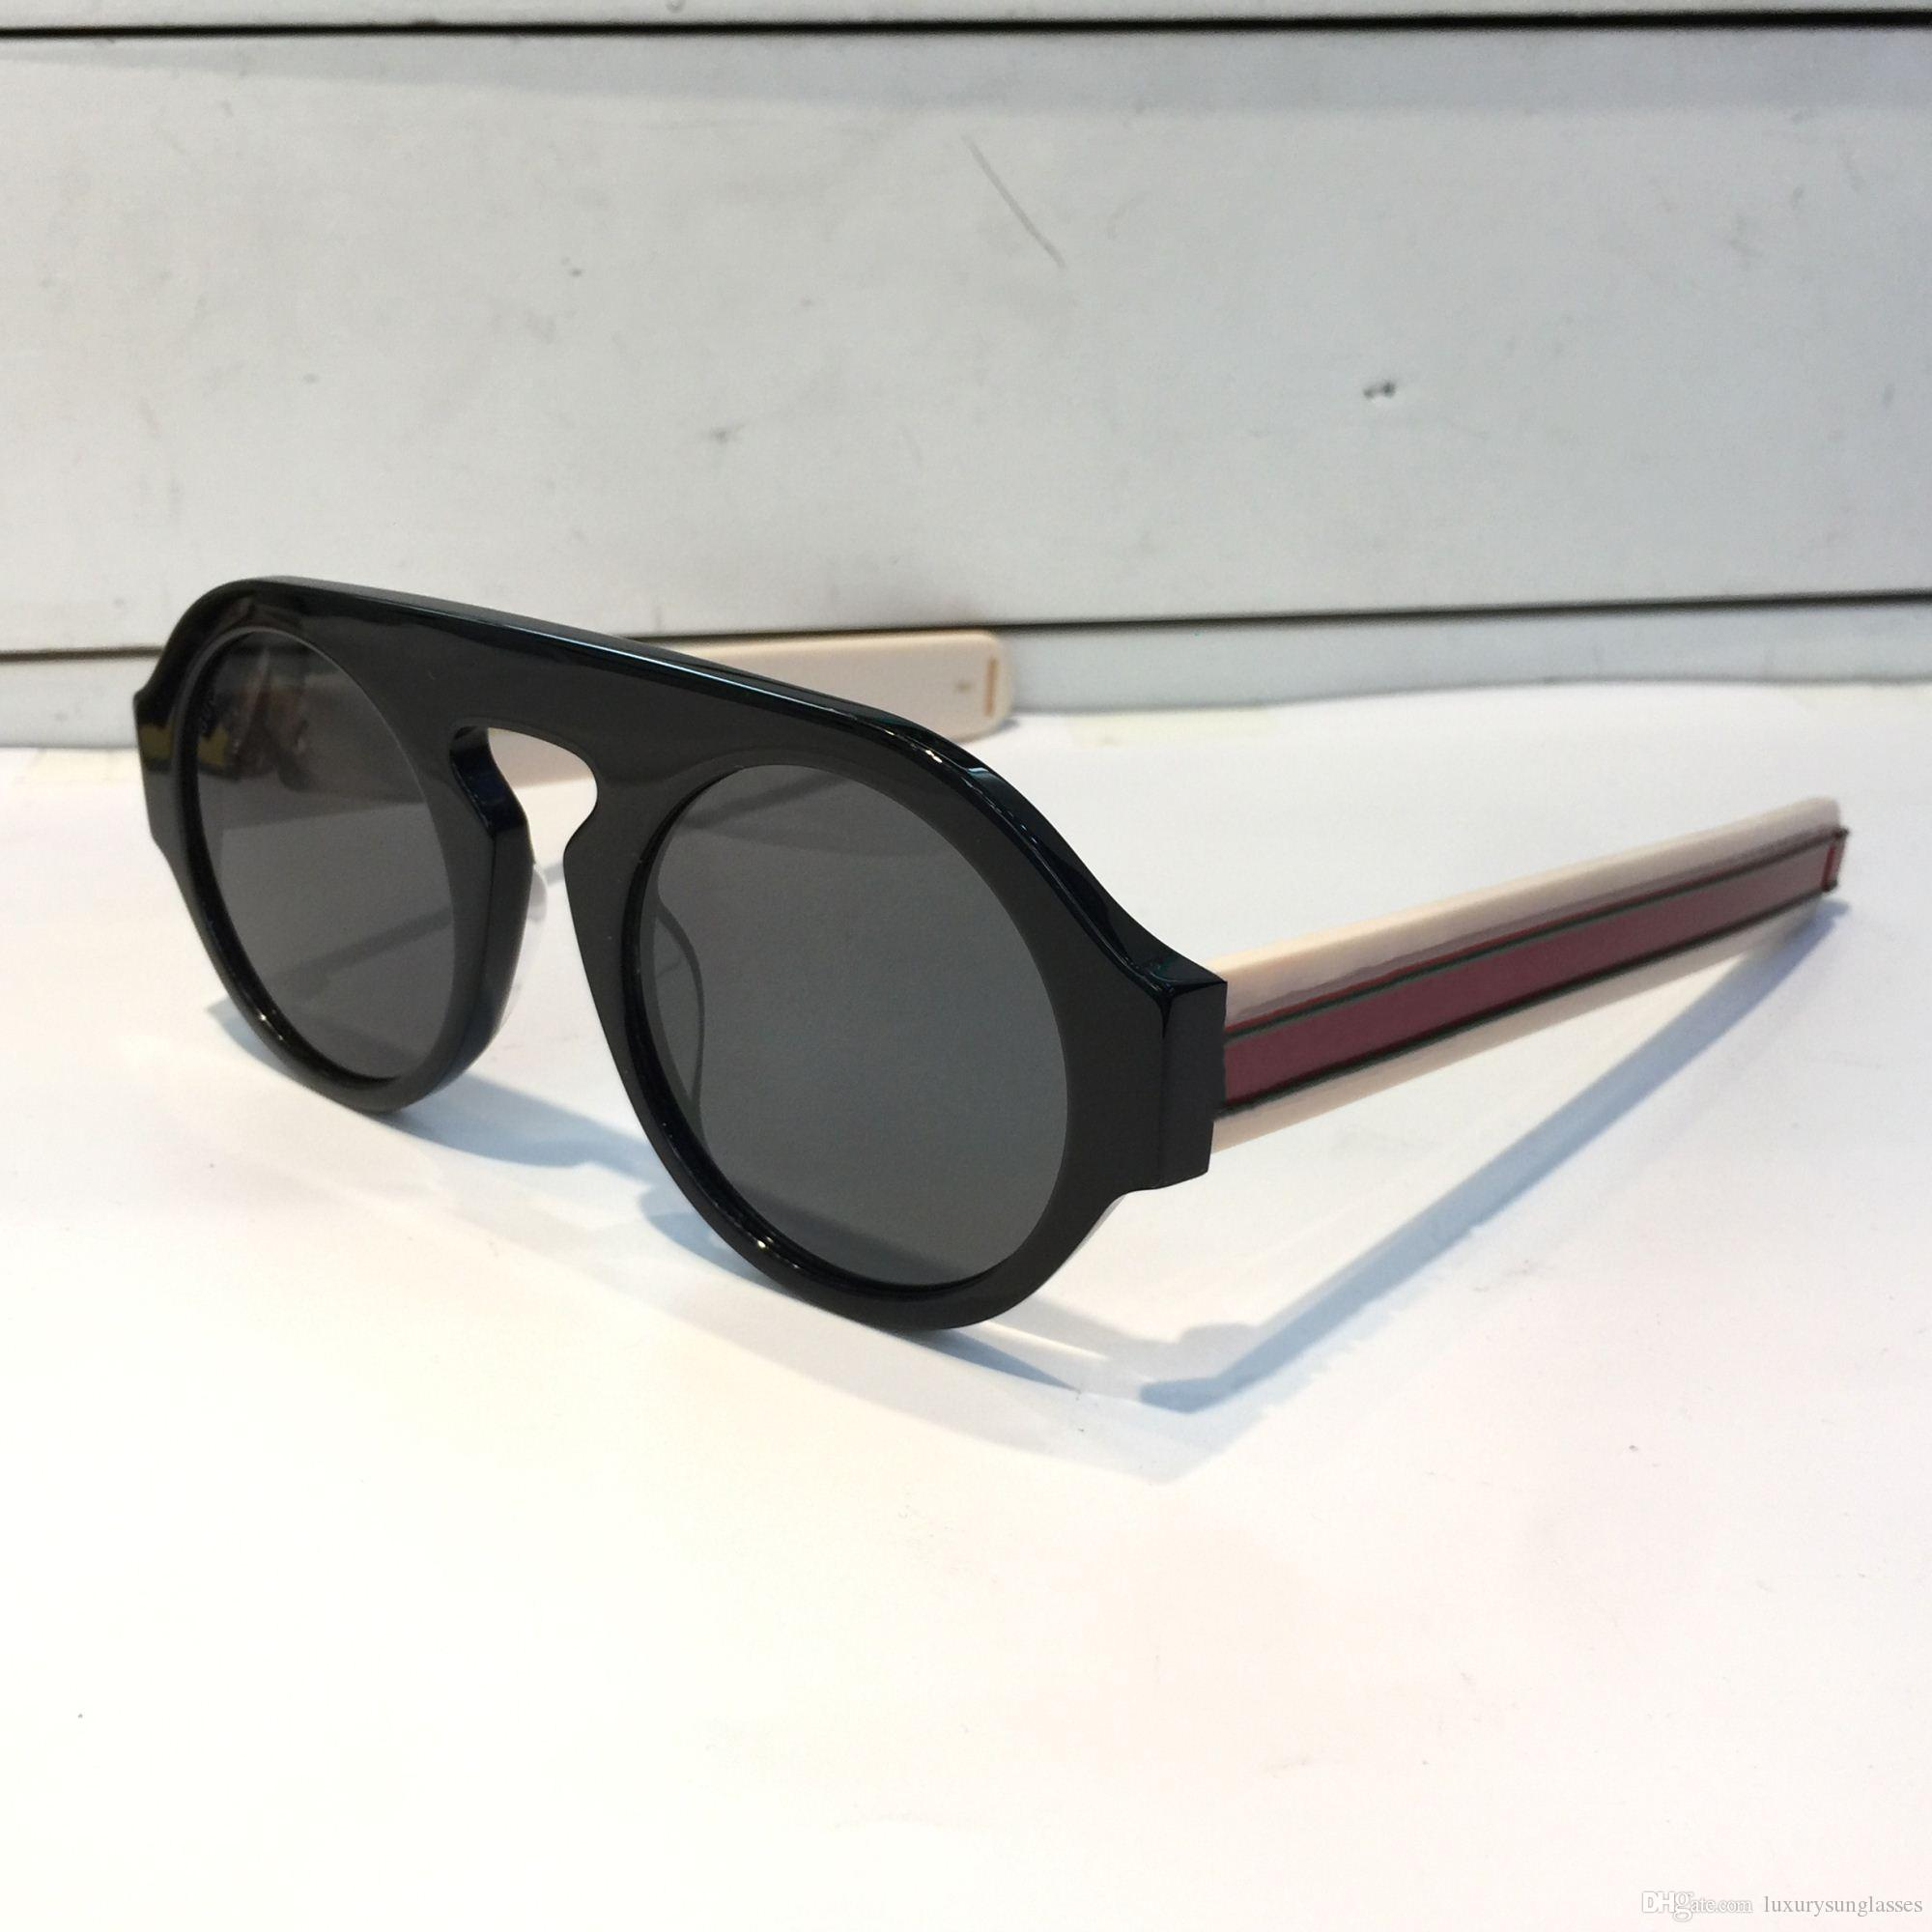 3edb4ed3a42 Luxury 0256 Sunglasses For Women Brand Designer 0256S Round Summer ...